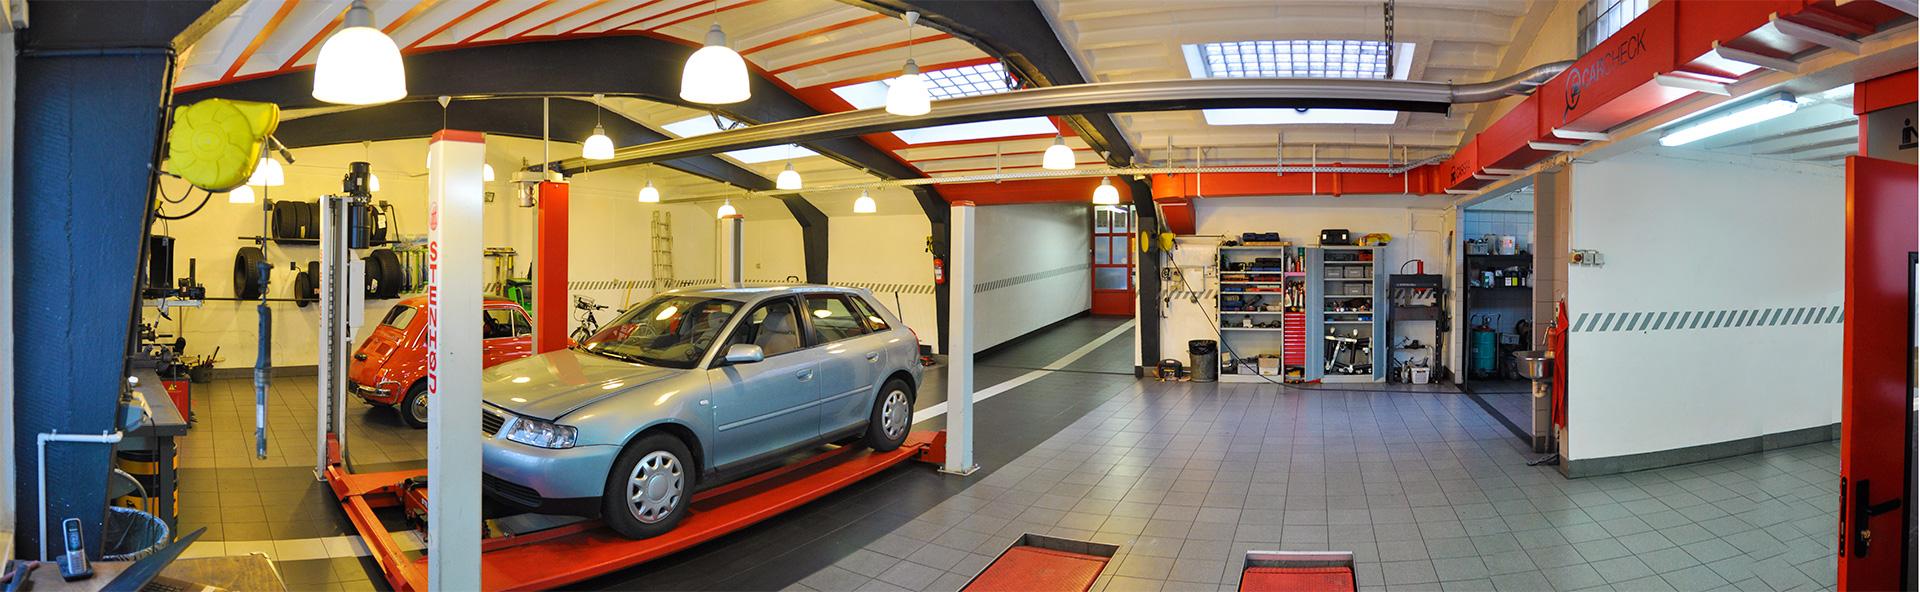 Garage Pitstop geneva